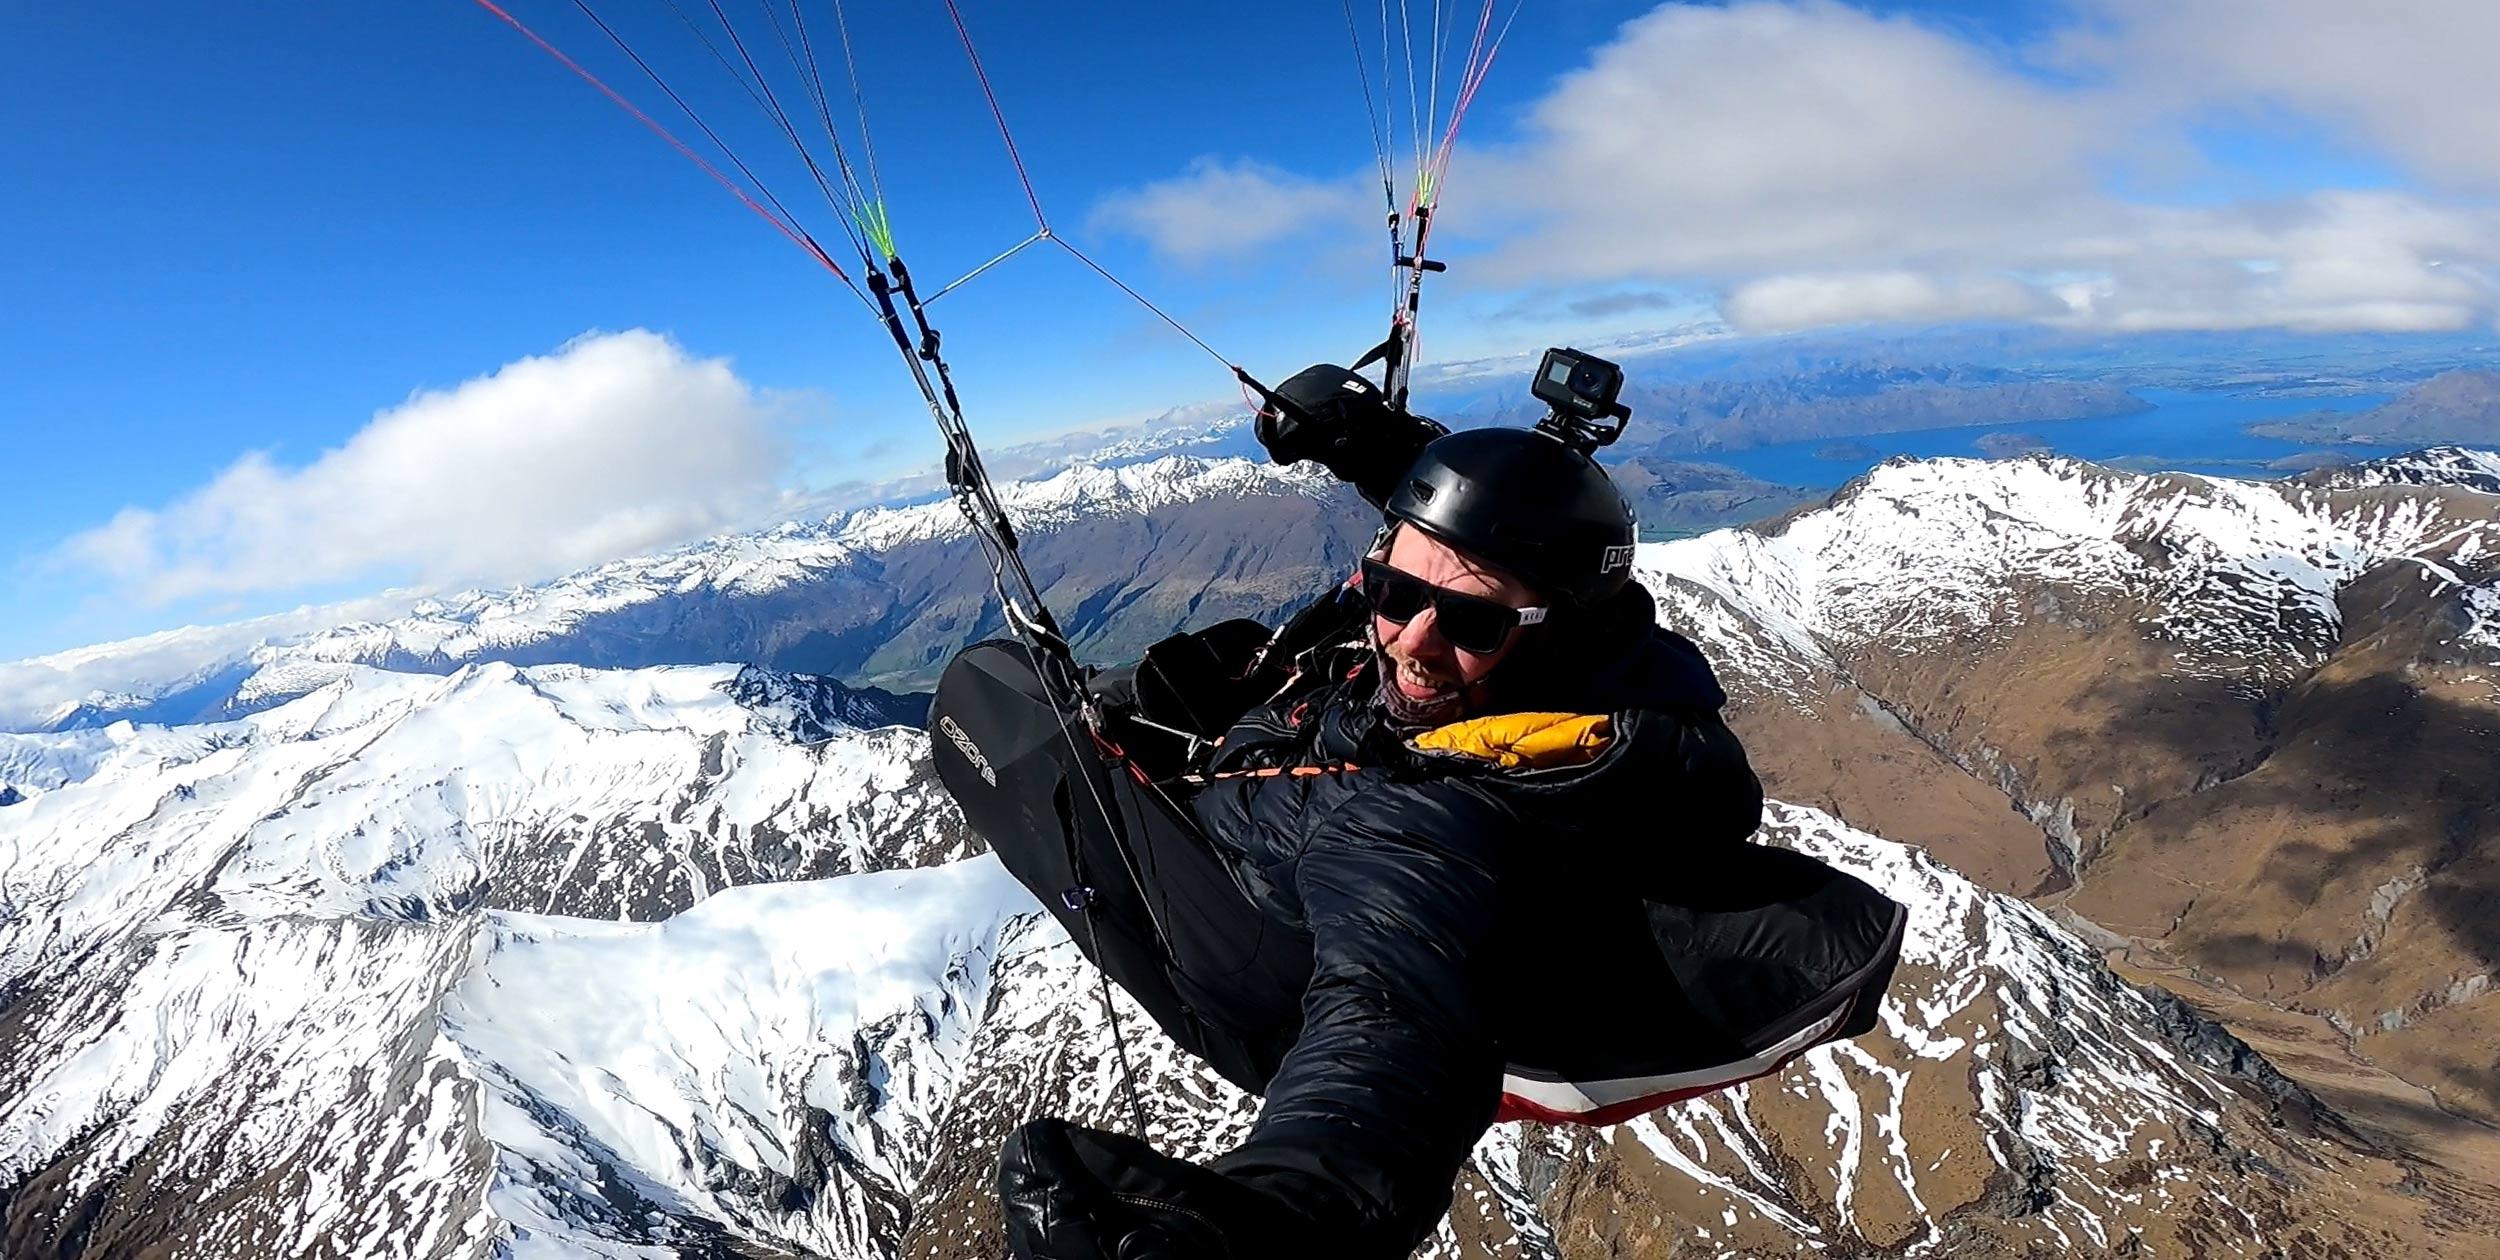 Ben Kellett, Flying up the Harris, New Zealand